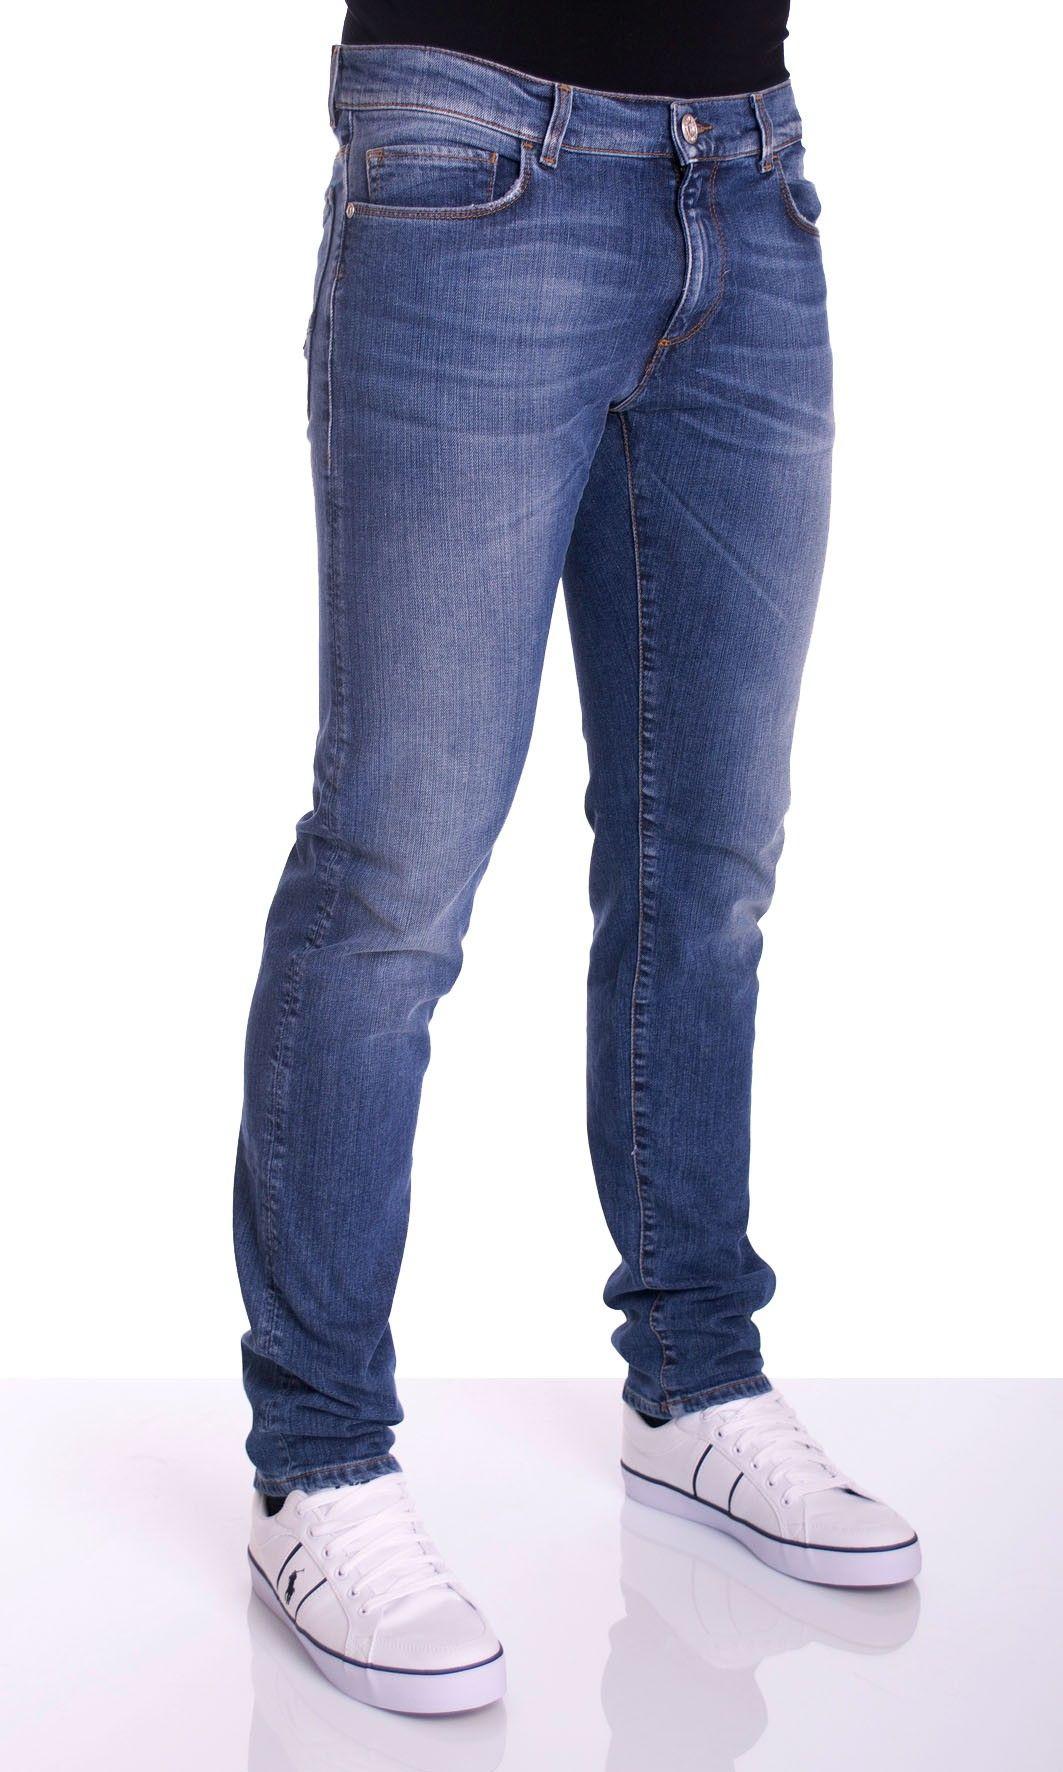 2207b603d1 Trussardi Jeans | Jeans TRU TRUSSARDI Uomo Denim mod.370 Close Fit ...